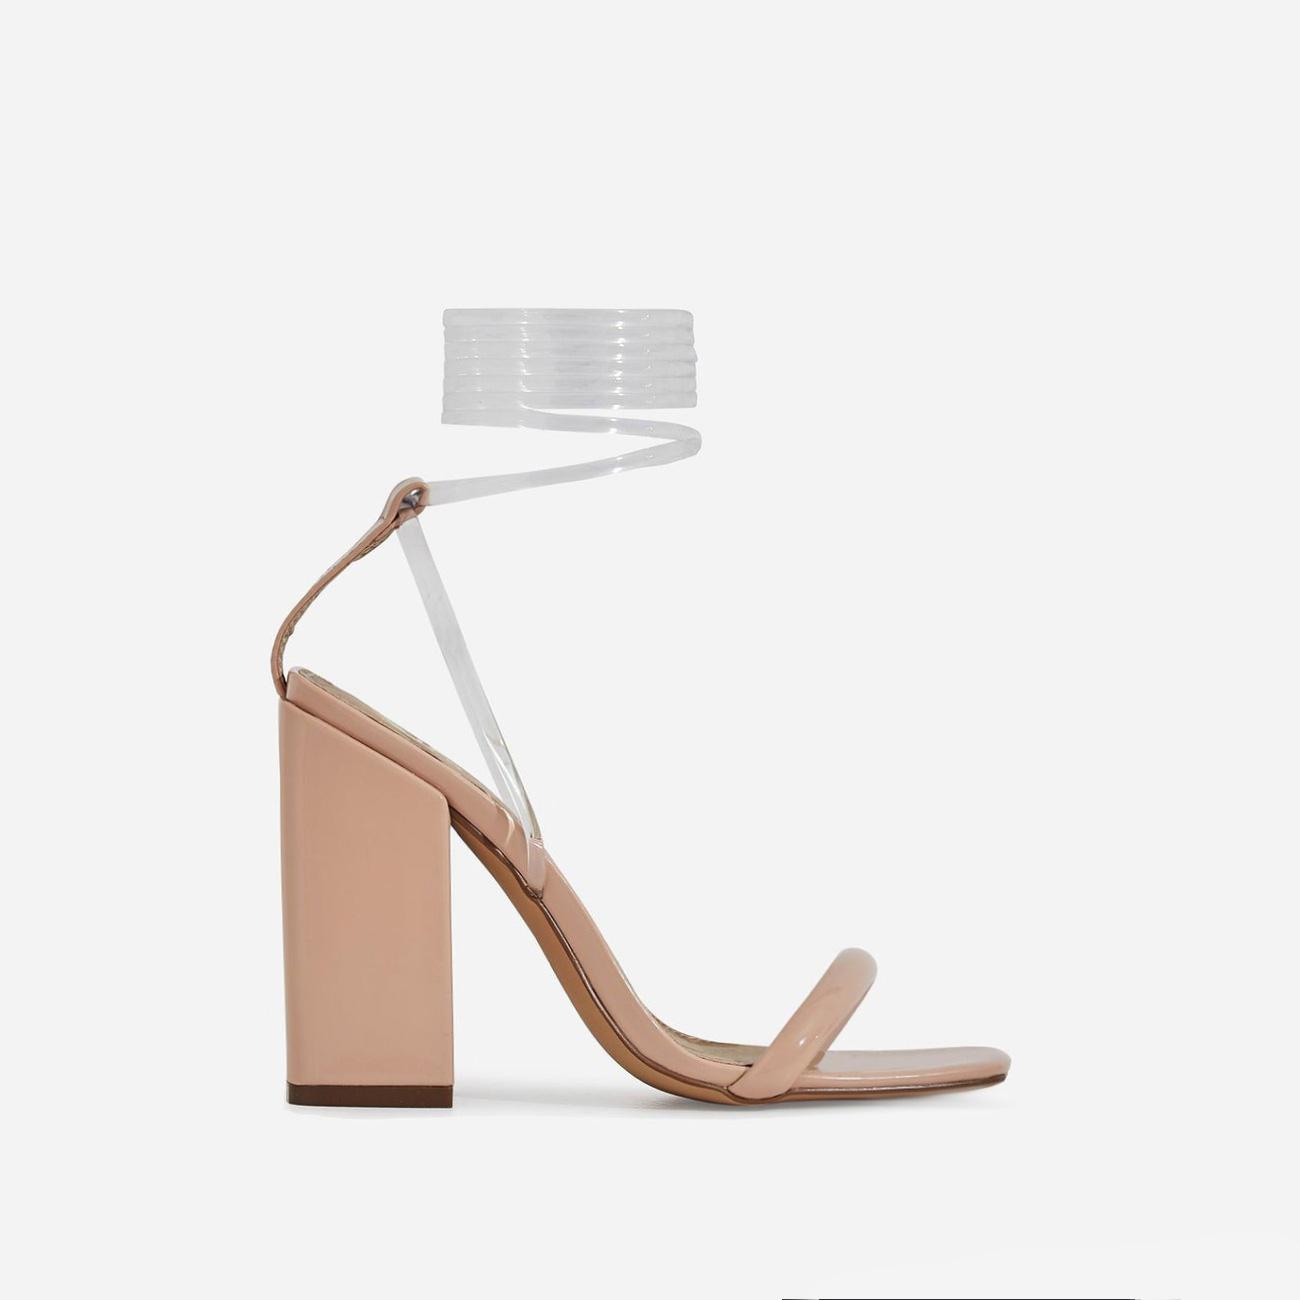 Mariah Perspex Square Toe Lace Up Block Heel In Nude Patent